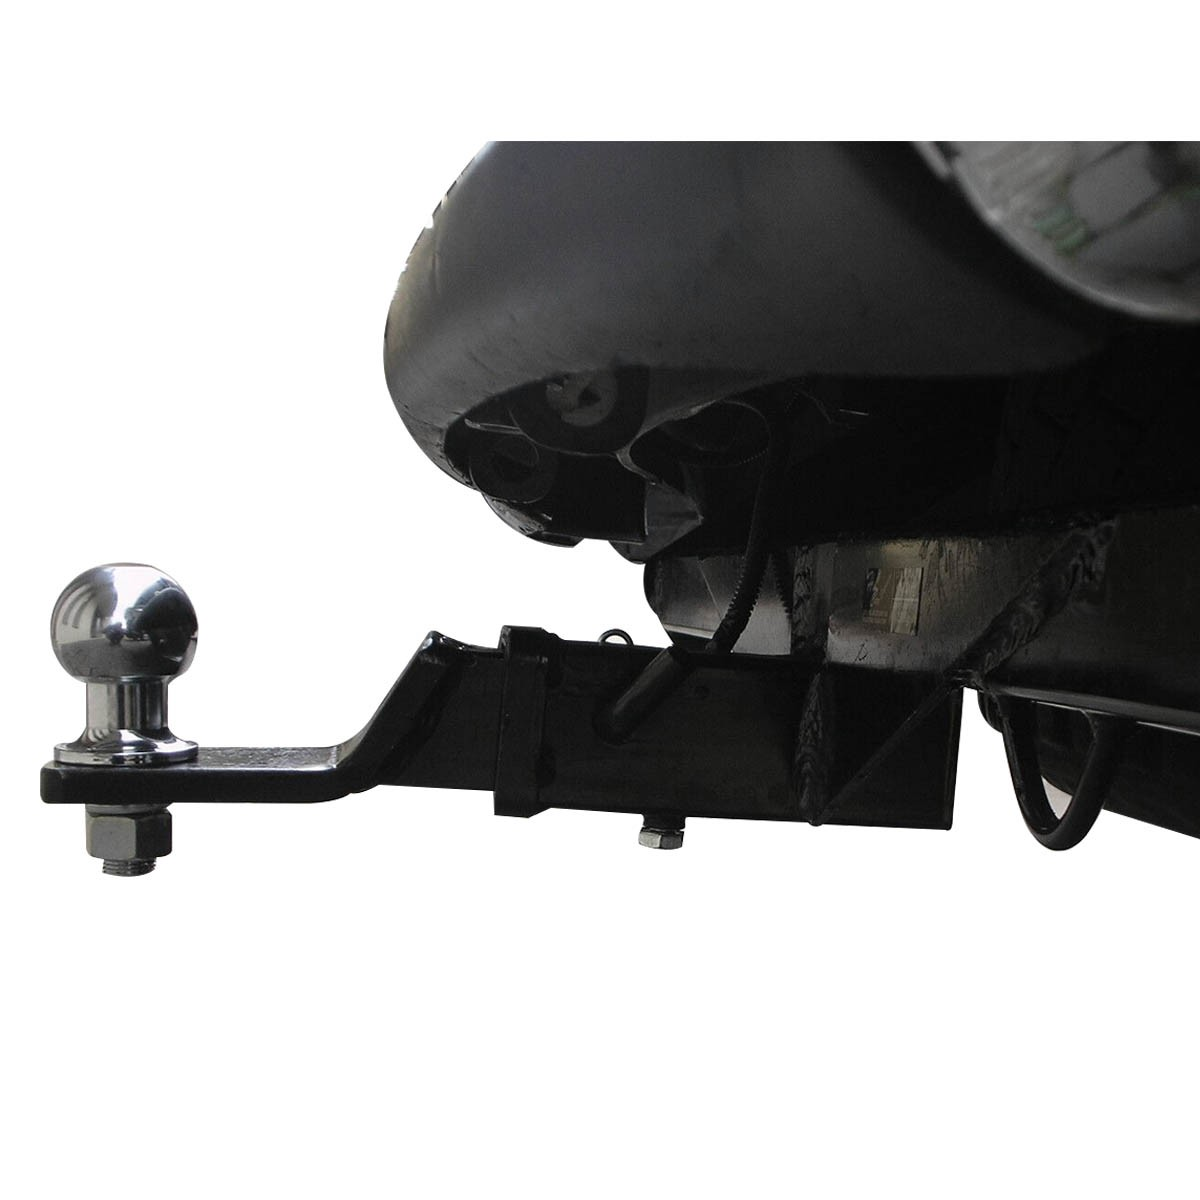 Engate de reboque removível F1000 1993 a 1998